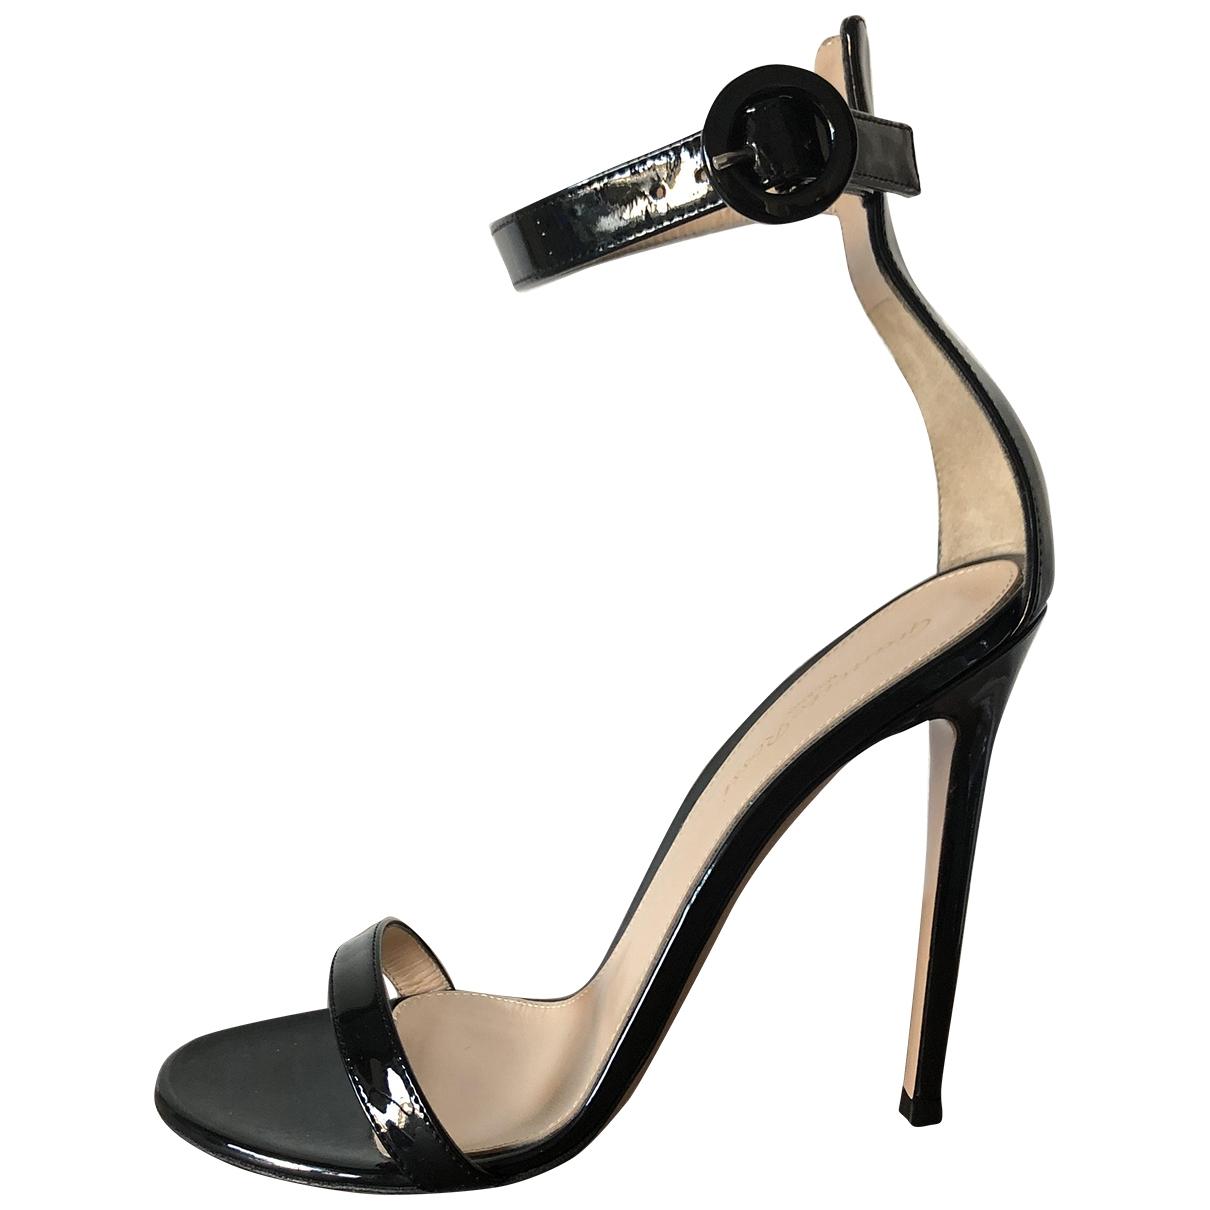 Gianvito Rossi - Sandales Portofino pour femme en cuir verni - noir